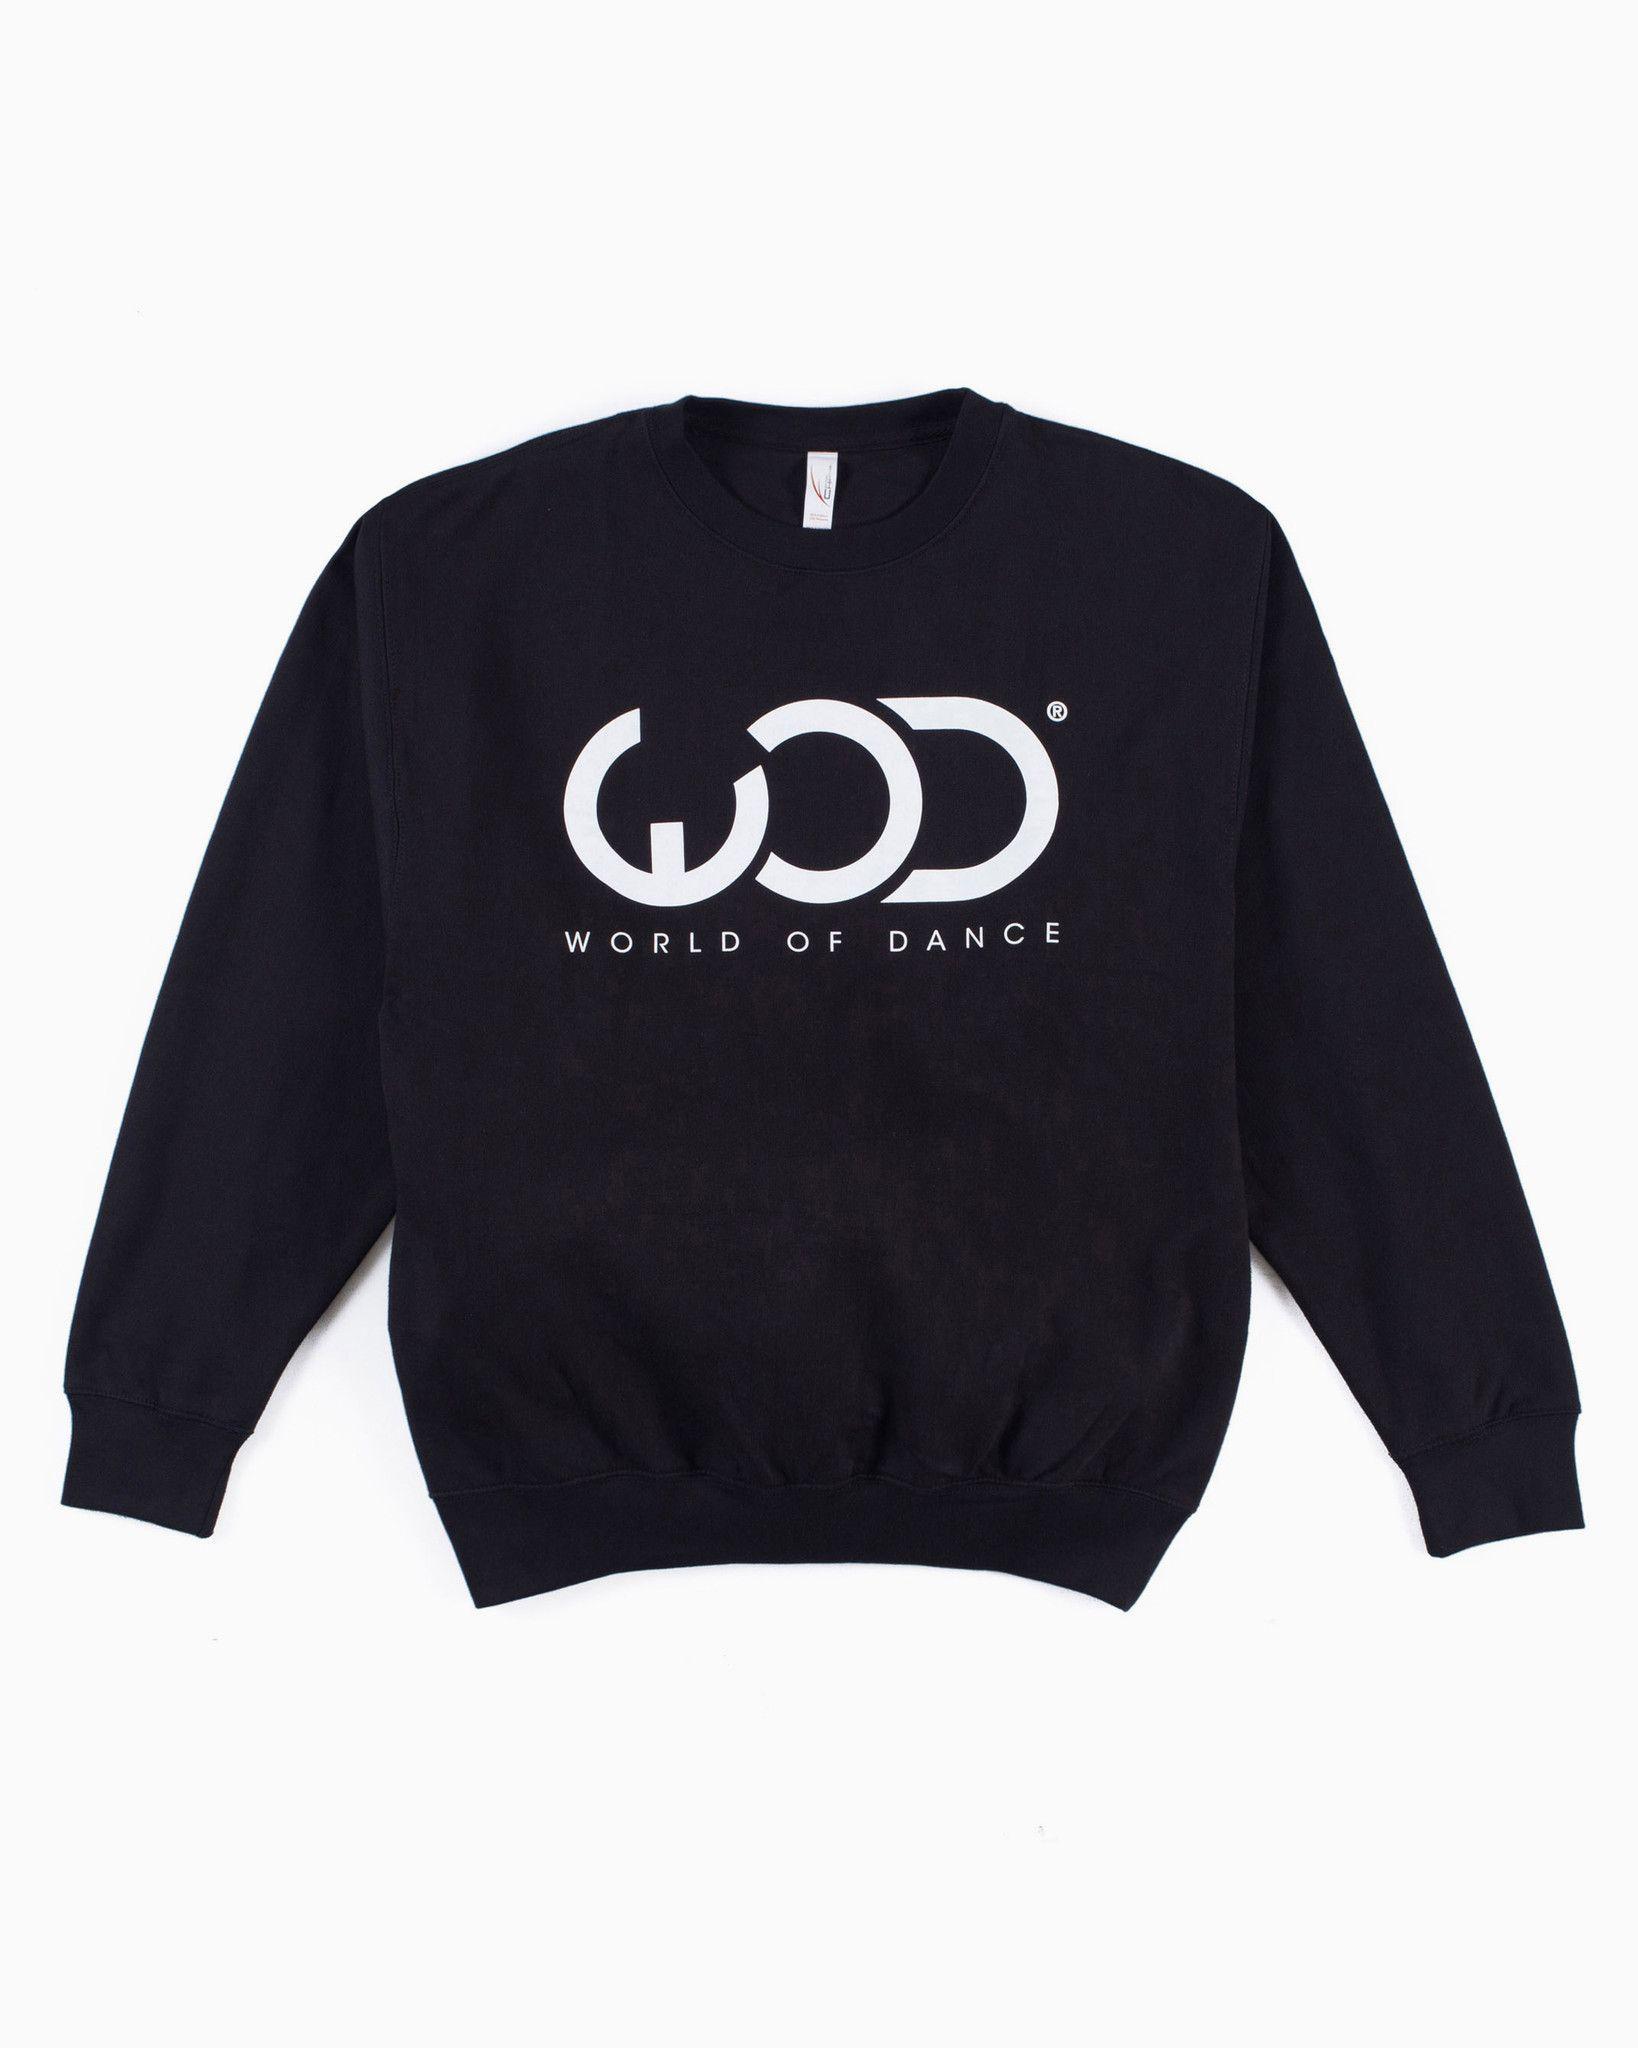 WOD LOGO CREWNECK   Products   Crew neck, Sweaters, Hip ...